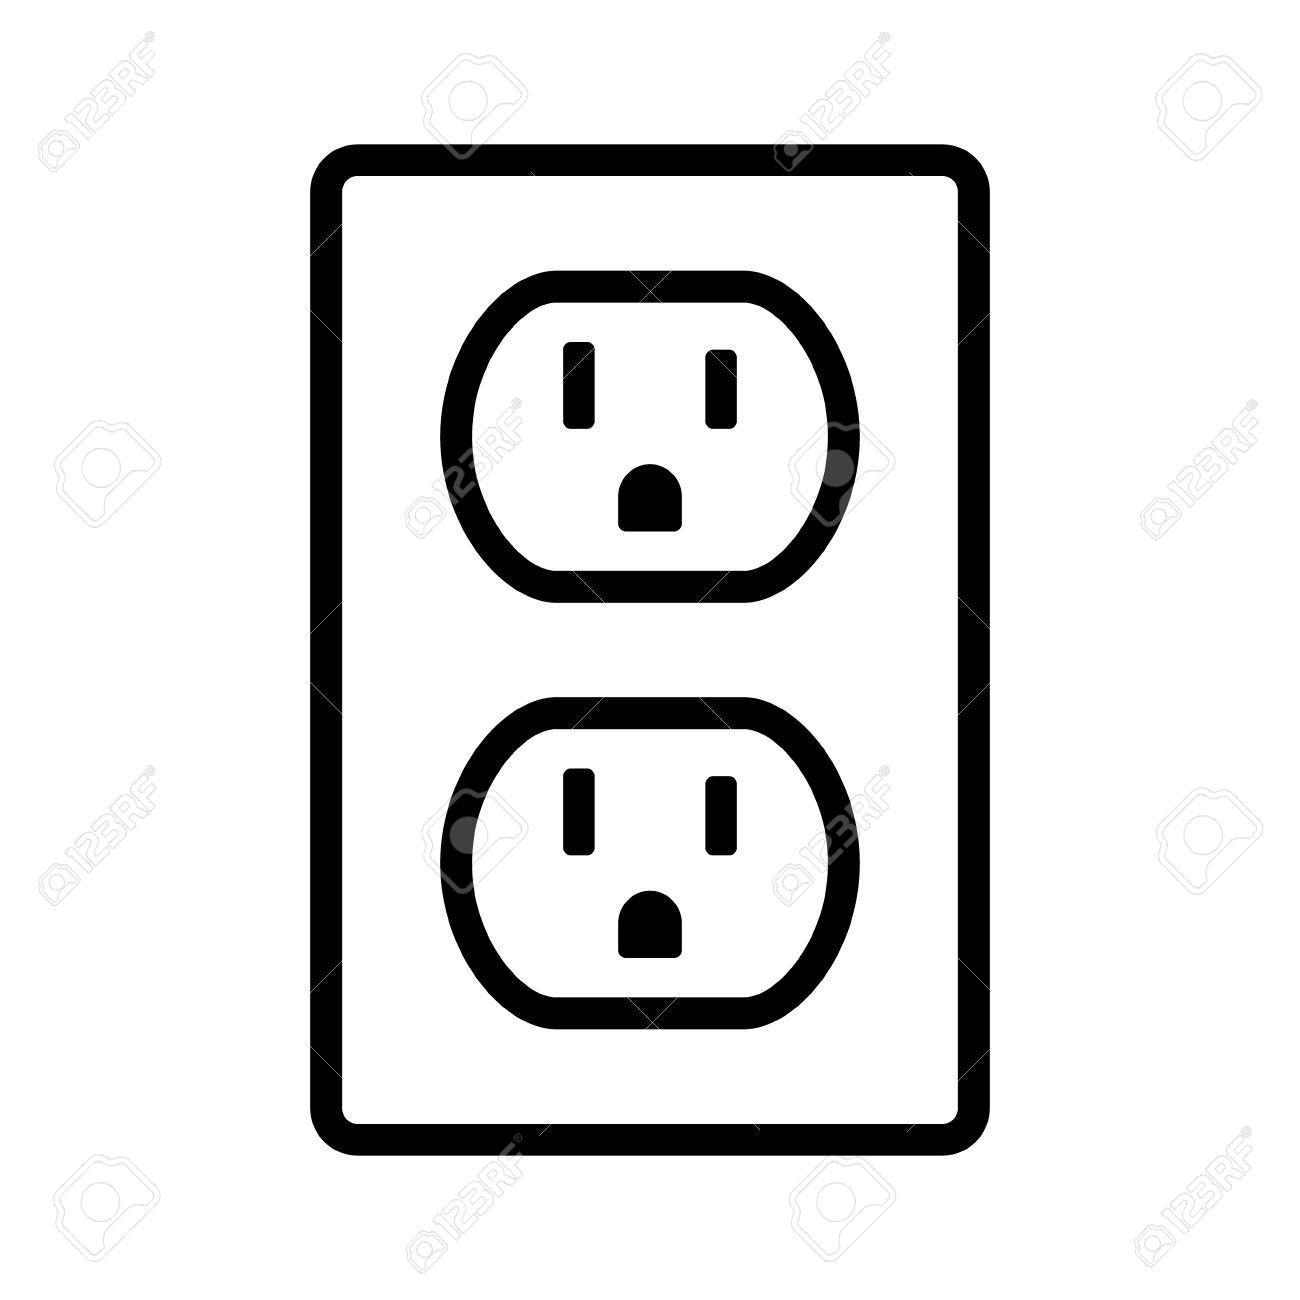 Two NEMA 5-15 Grounded Power Outlet / Ac Socket Line Art Vector ...